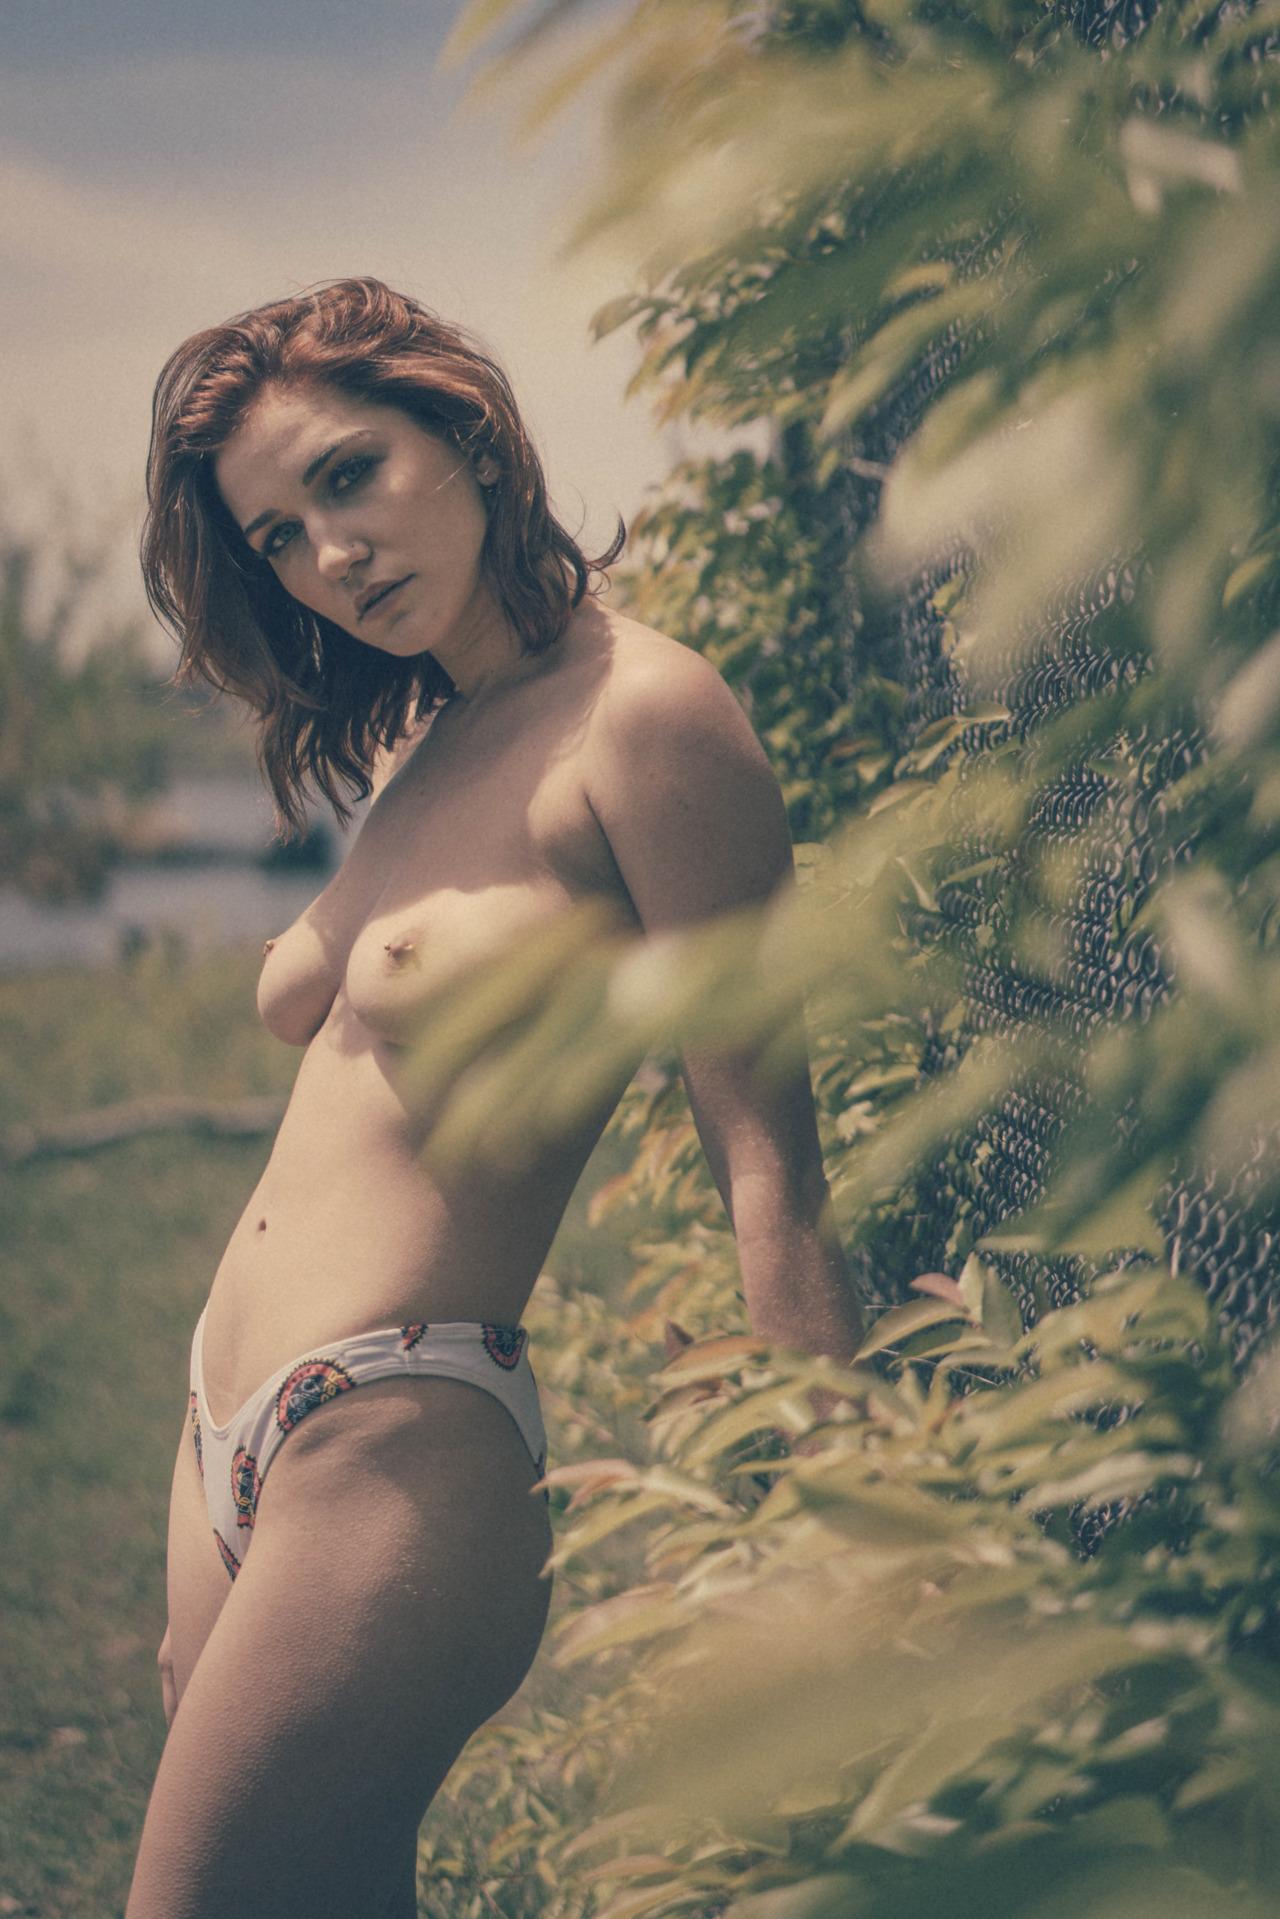 Skye Blue - Zeno Gill photoshoot